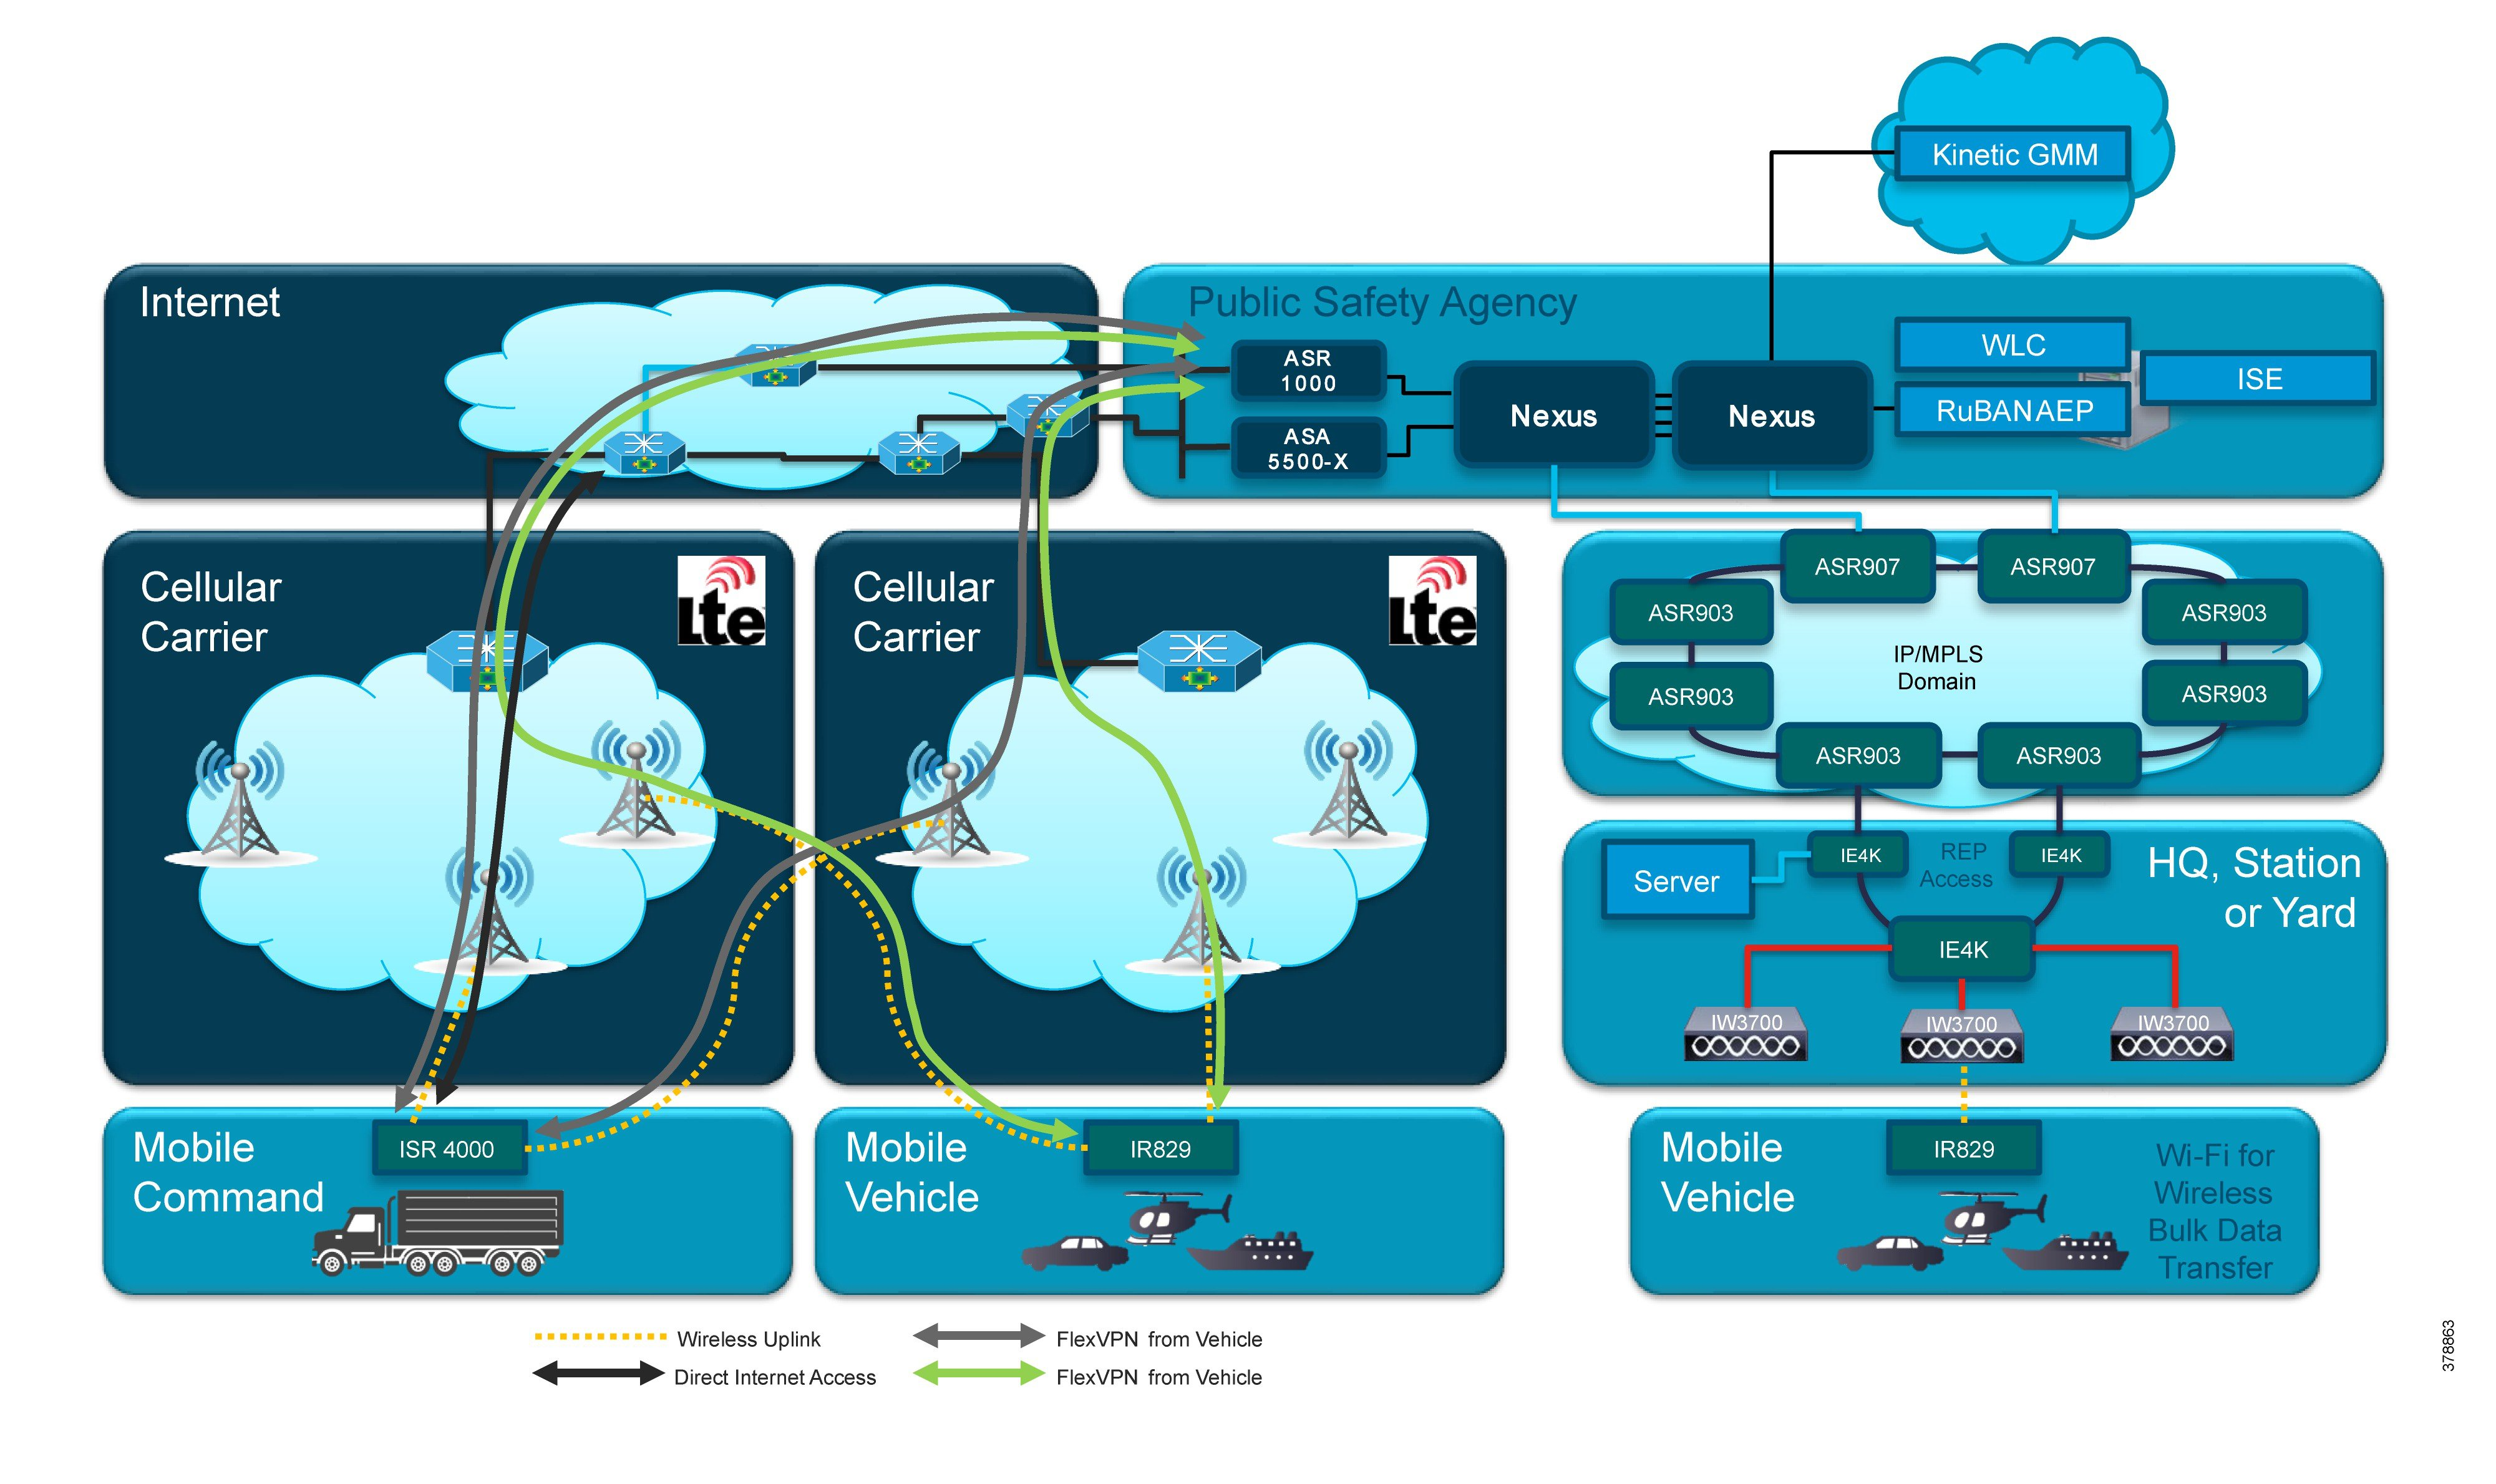 First Responder Fleet Cisco Reference Design (CRD) - First